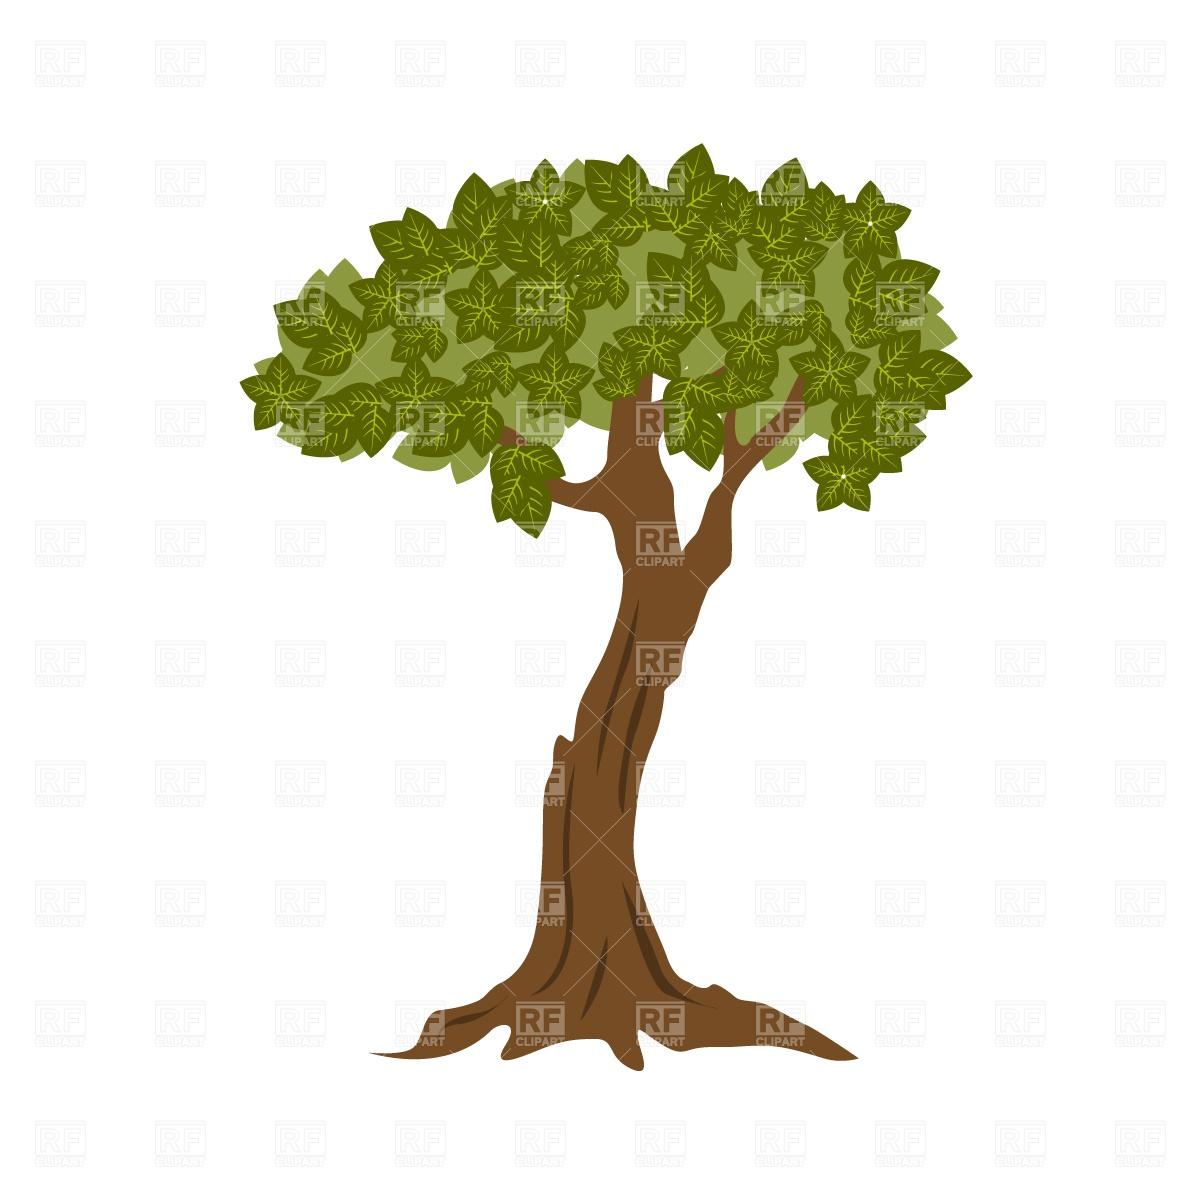 dead tree silhouette clip art at getdrawings com free for personal rh getdrawings com clip art of trees with roots clip art of trees with roots